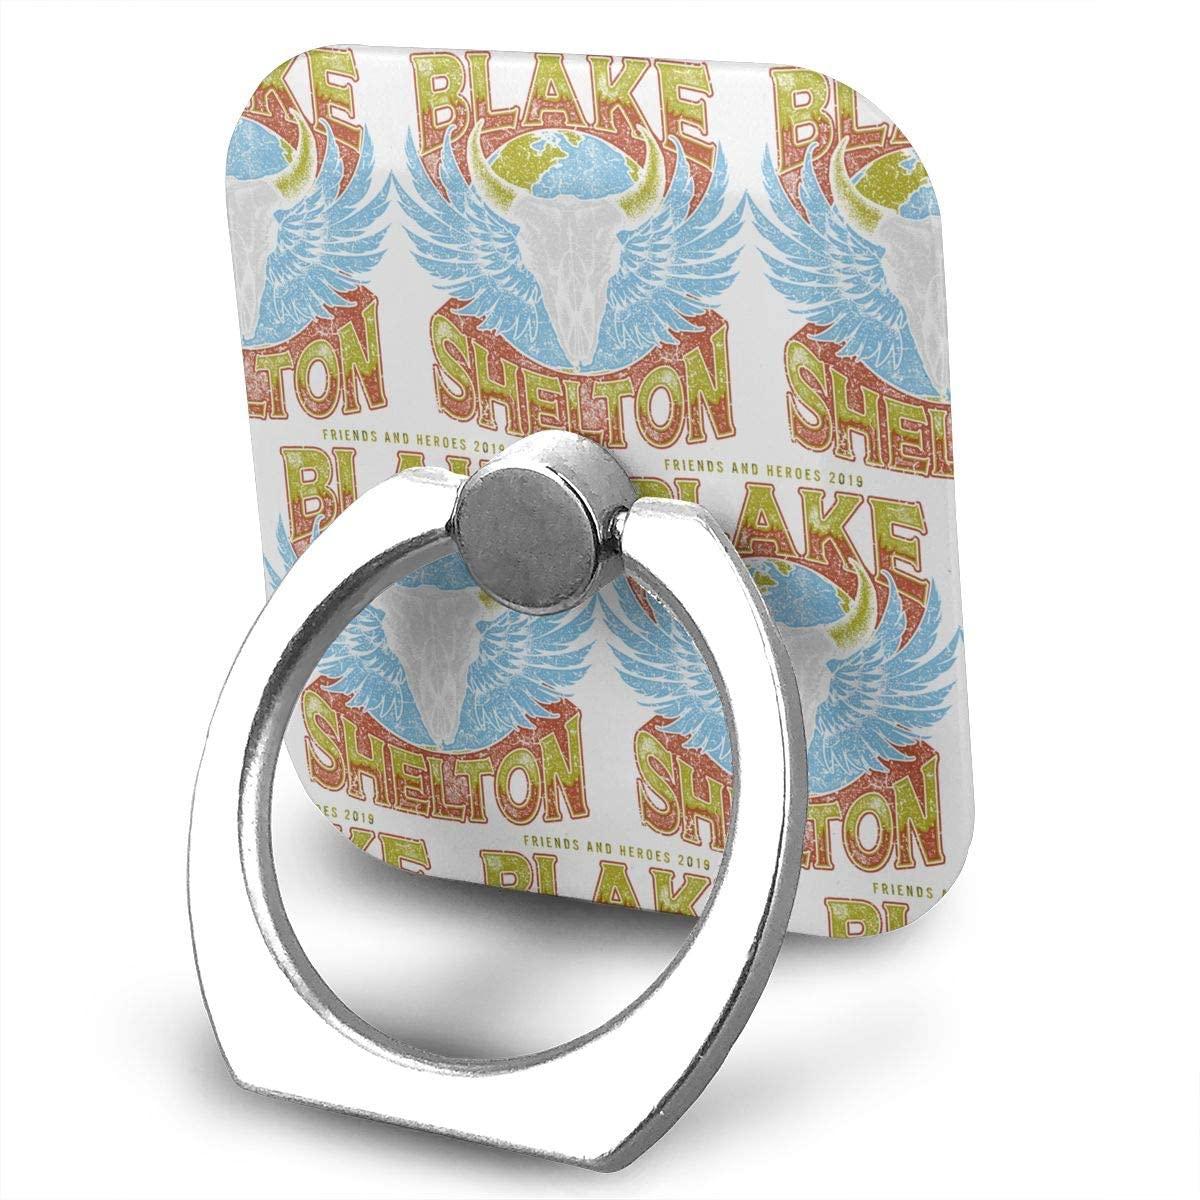 Blake Shelton Phone Finger Ring Stand Bracket Holder Smartphone Grip Stand Holder 360 Degree Rotating Sticky Cute